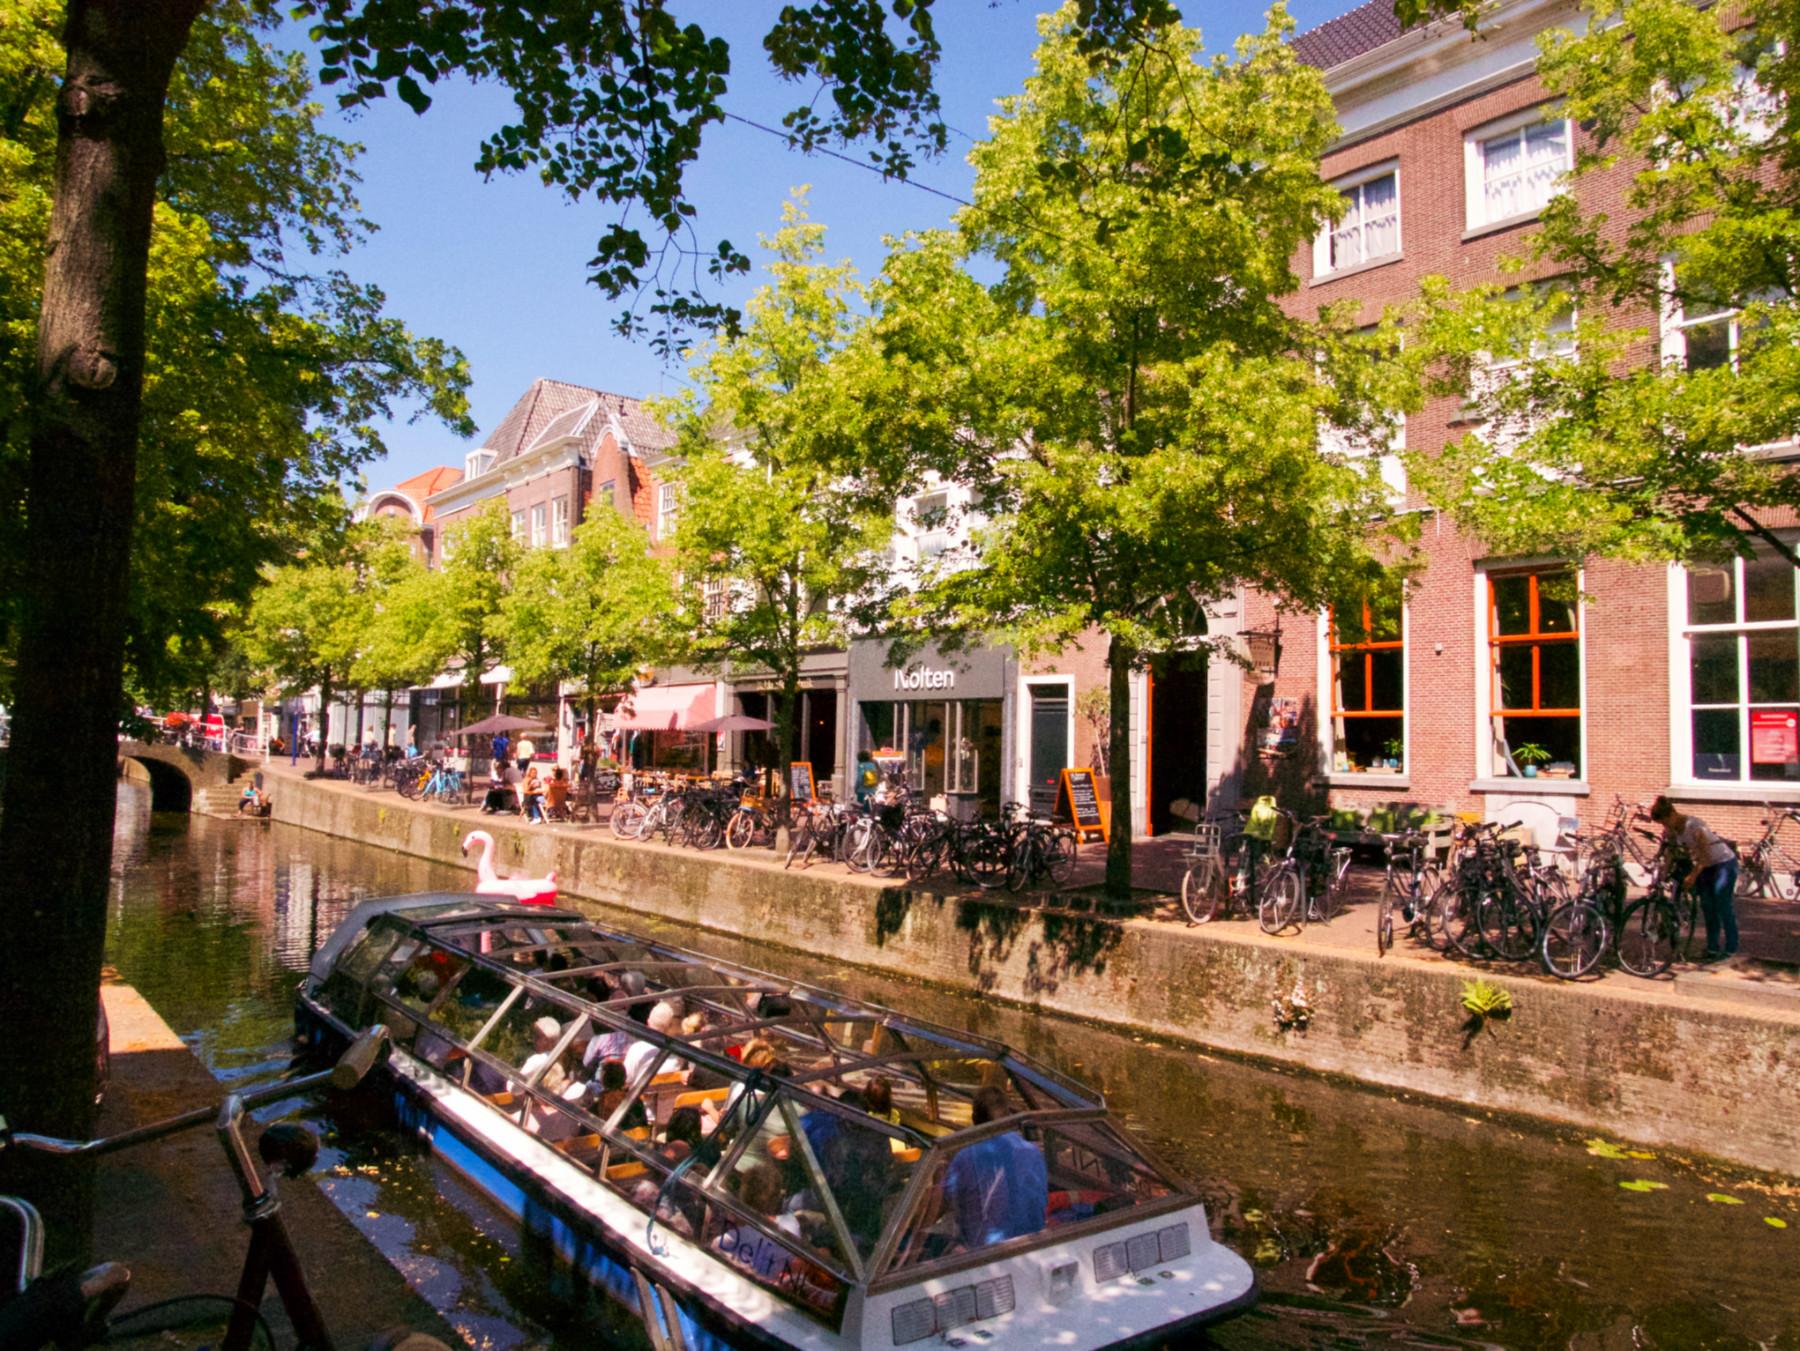 071-Nederland-Delft